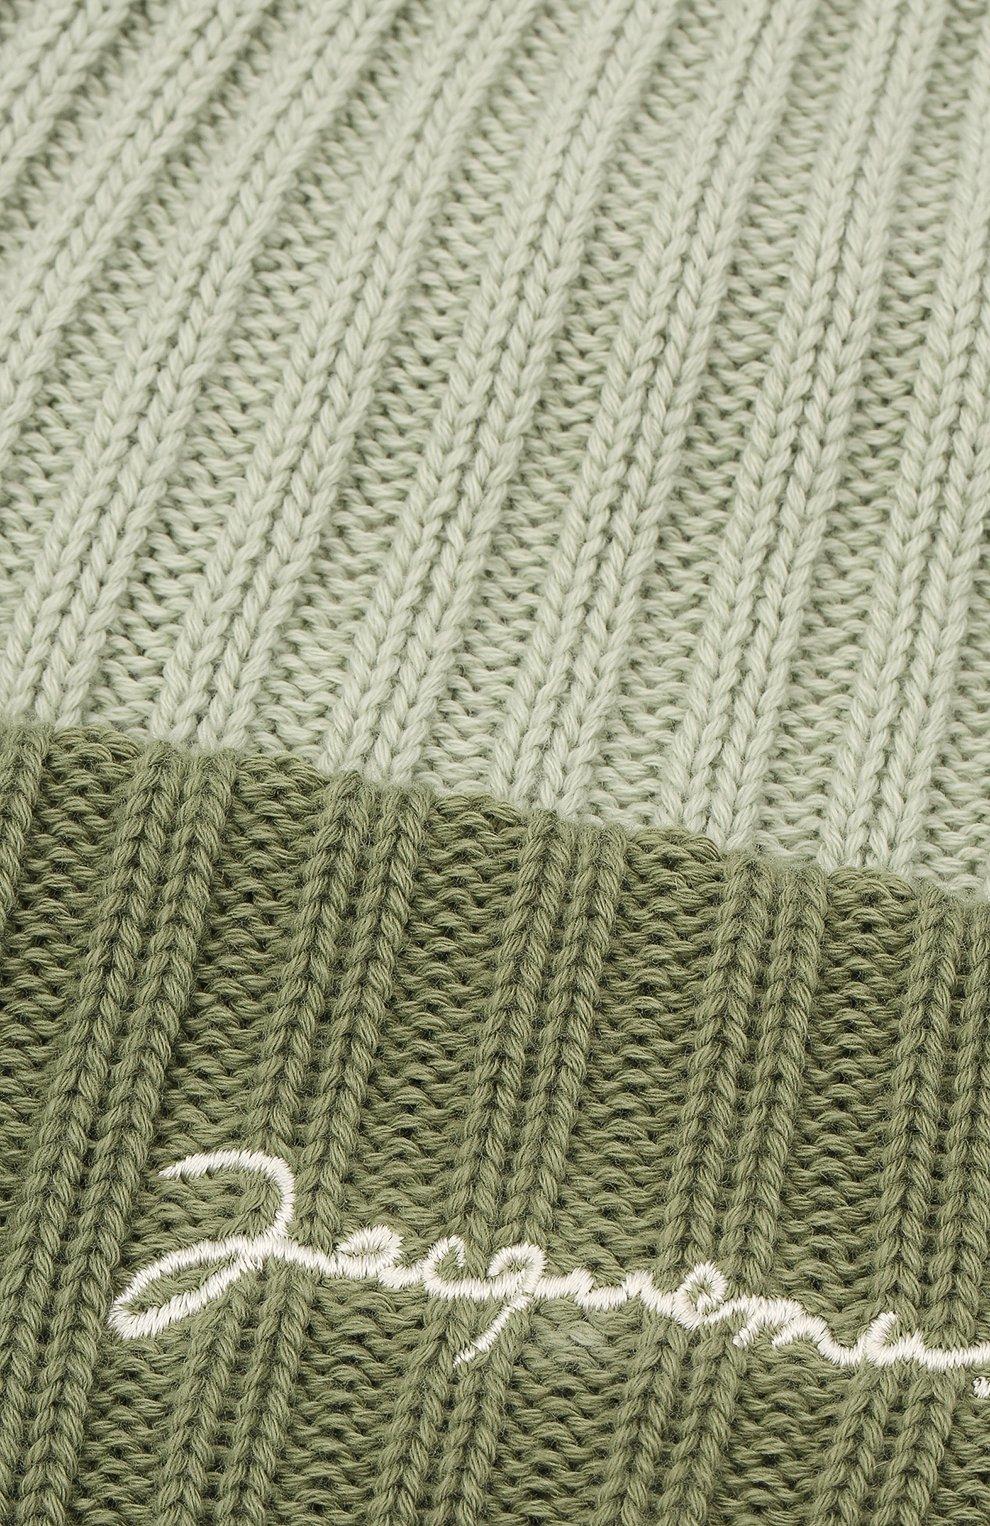 Мужская хлопковая шапка le bonnet JACQUEMUS зеленого цвета, арт. 206AC07/514560 | Фото 3